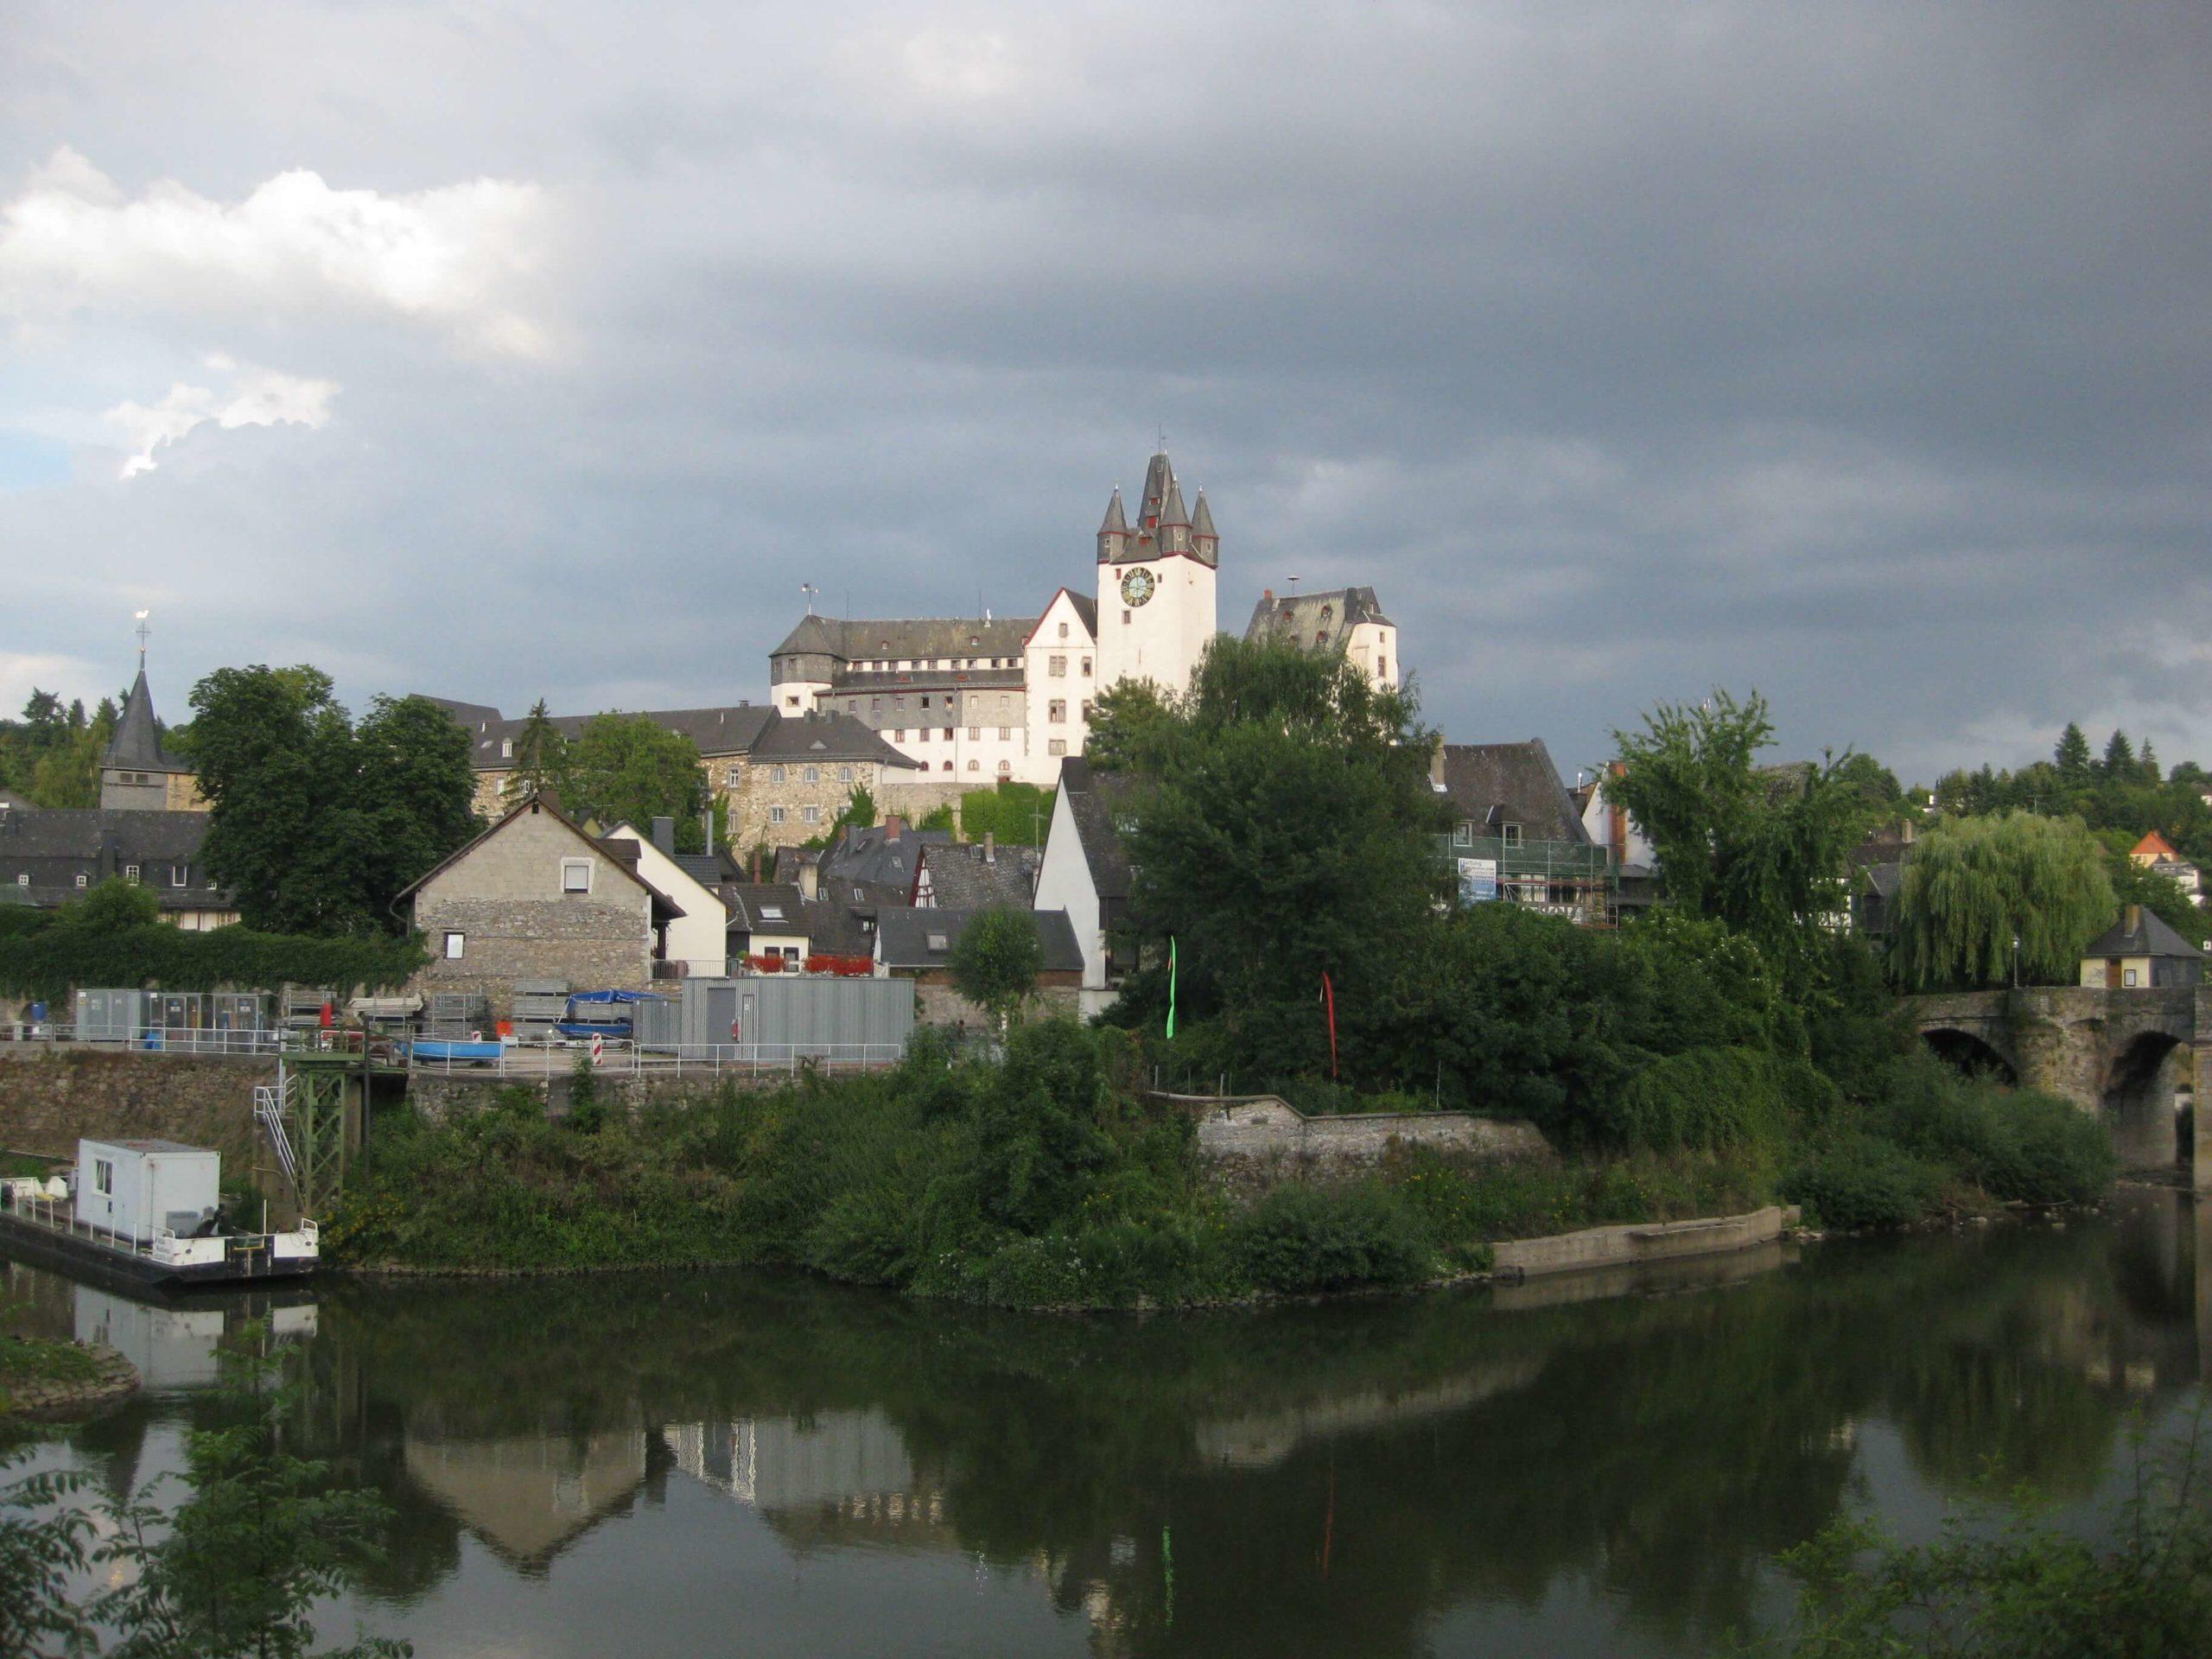 Eppstein and Diez – Germany